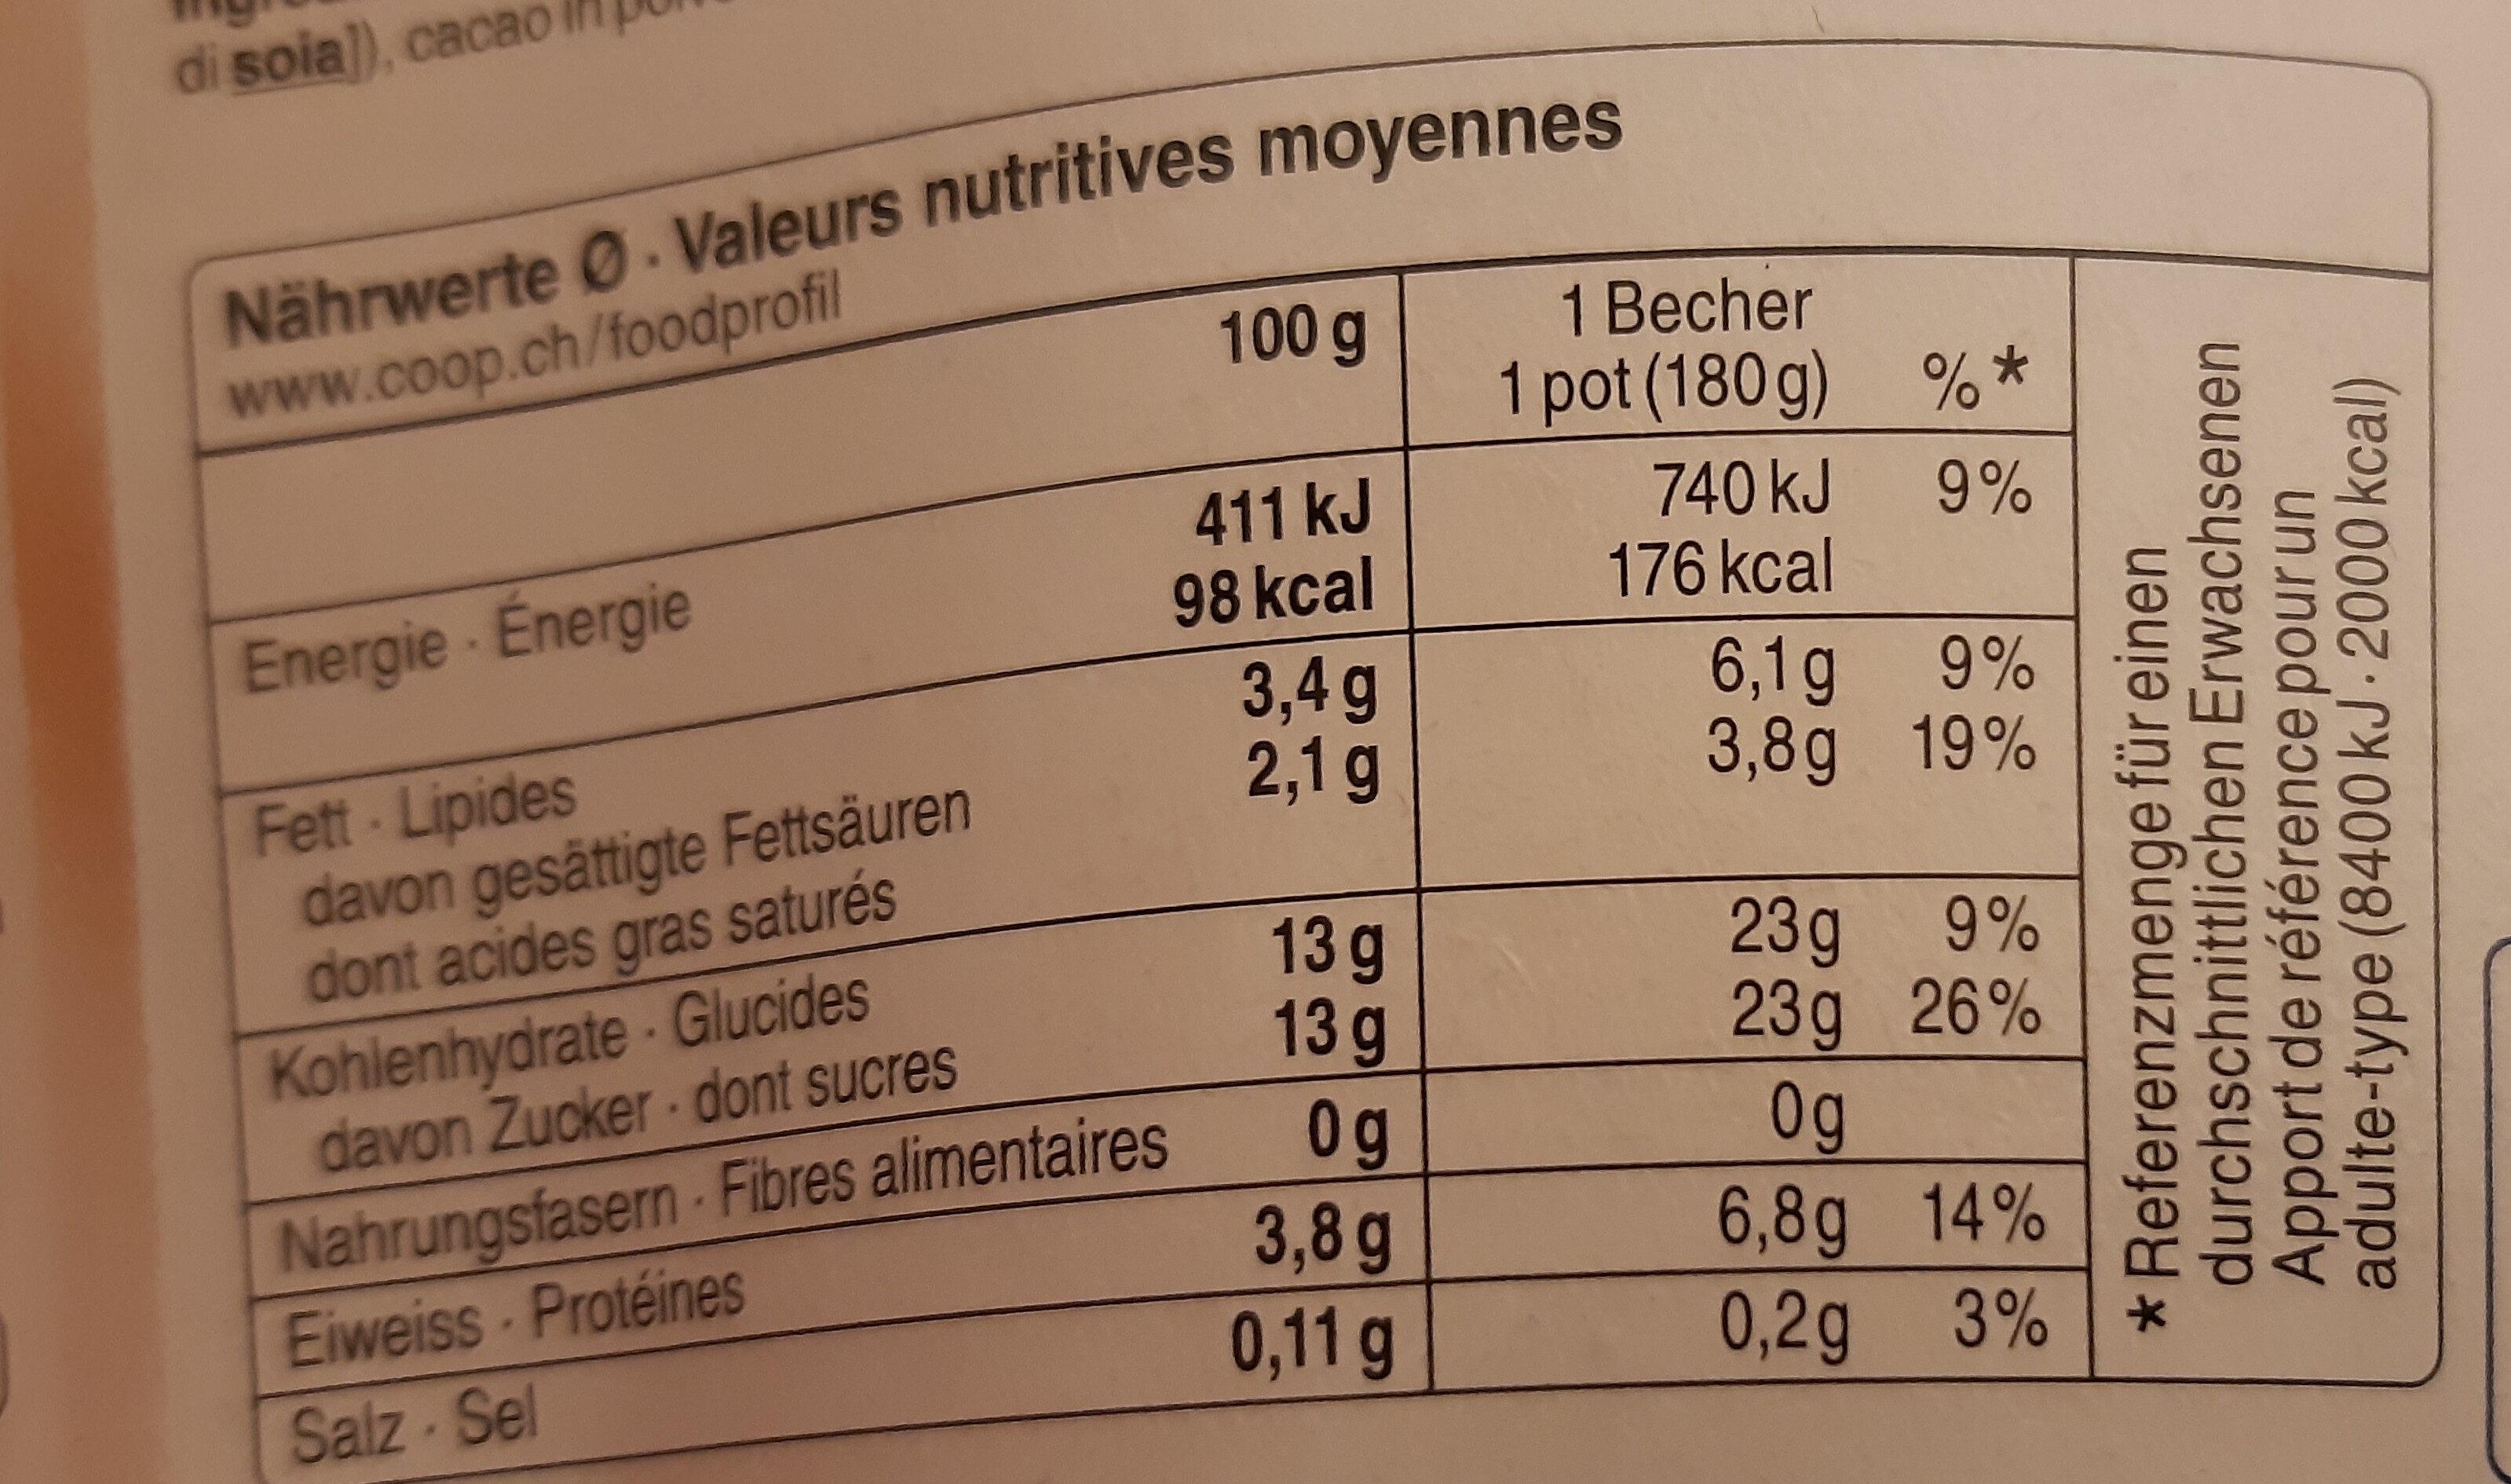 Jogurt chocolat - Nutrition facts - fr